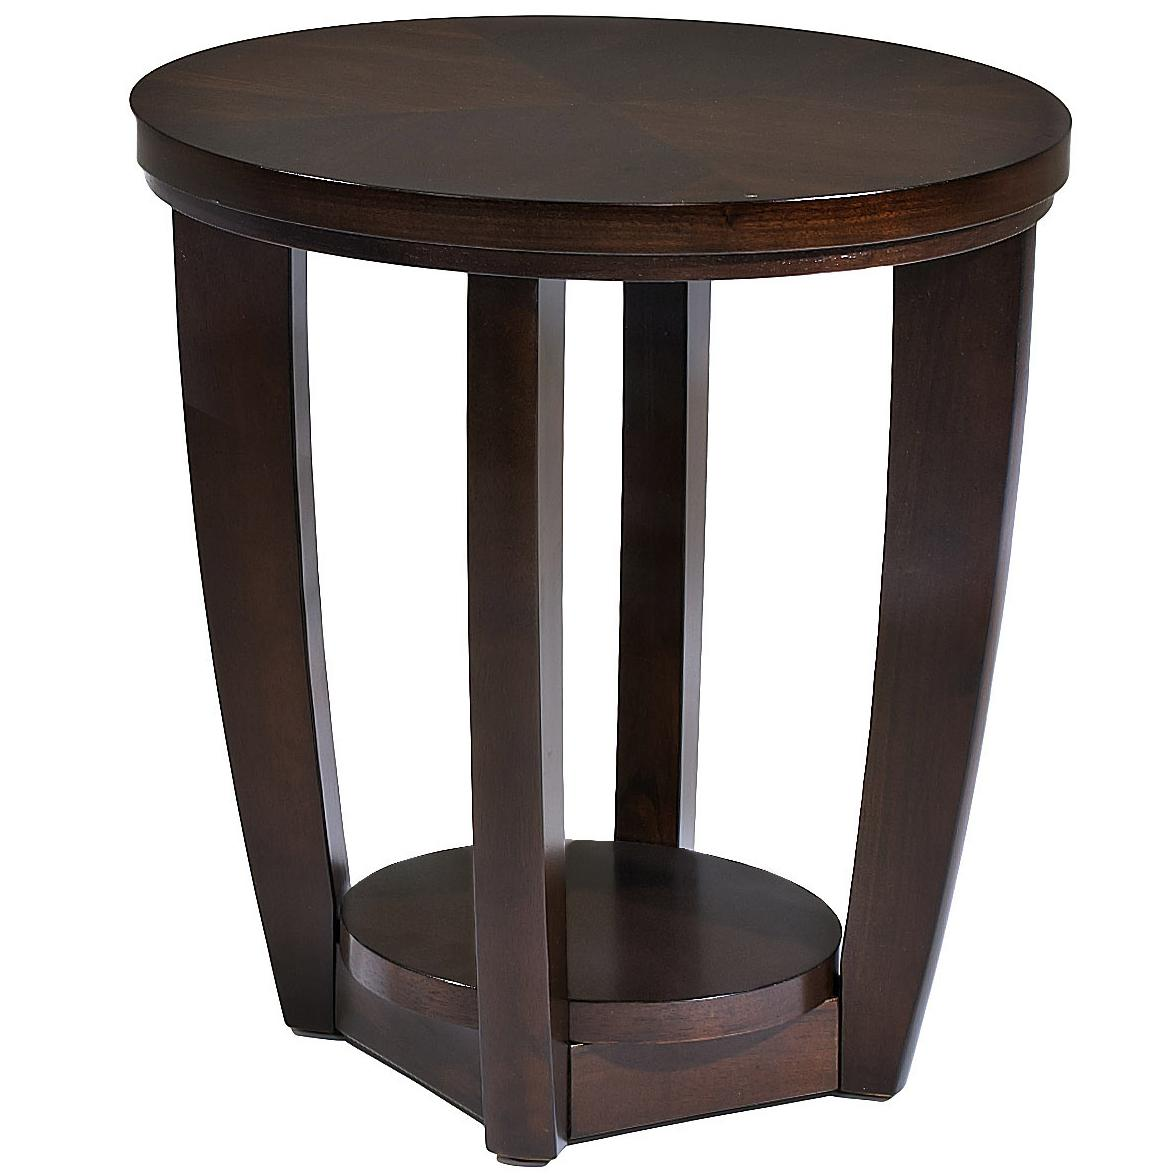 Morris Home Furnishings Hayden  Ottawa Falls End Table - Item Number: 764-808 ETBL